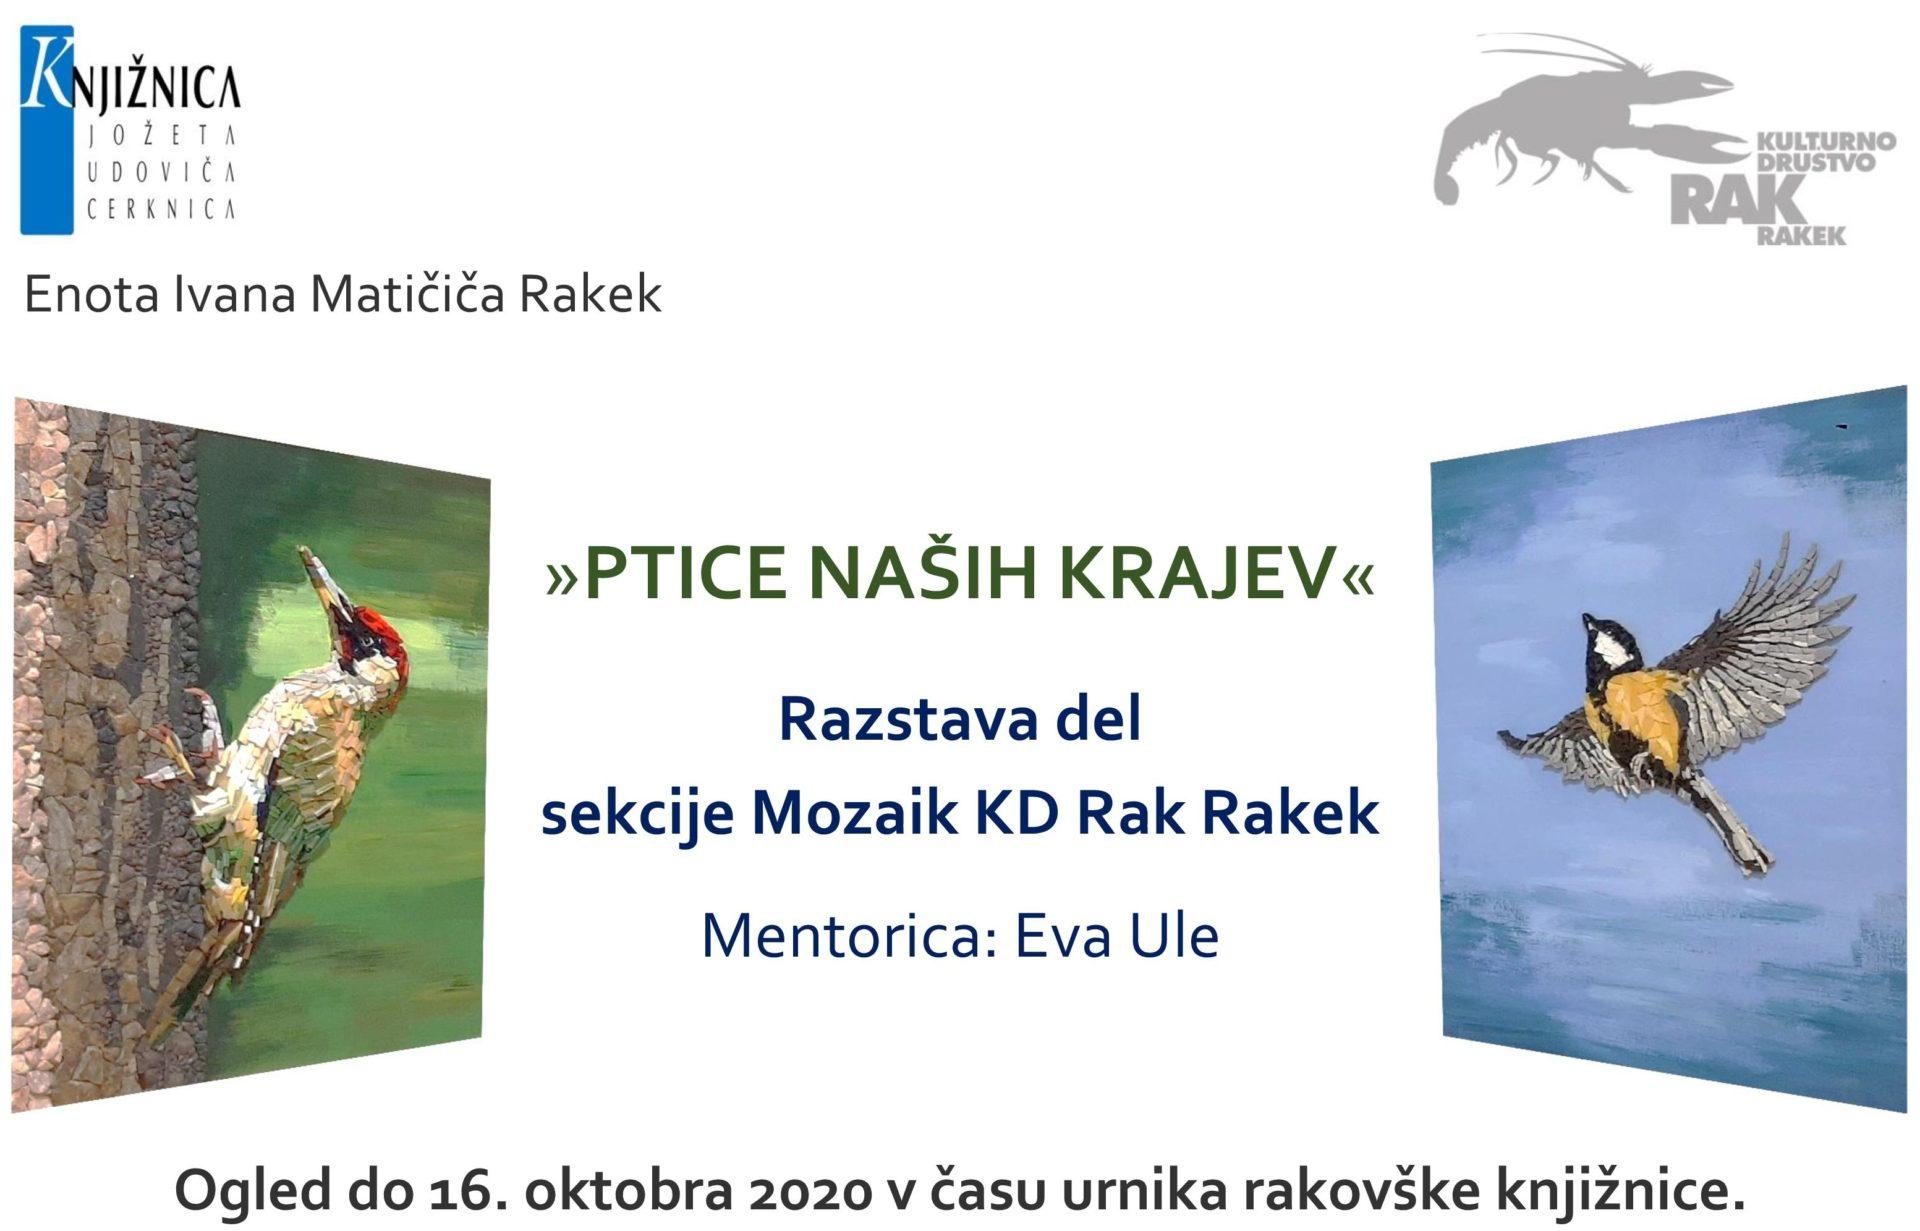 cover2 - Ptice naših krajev – razstava sekcije Mozaik KD Rak Rakek